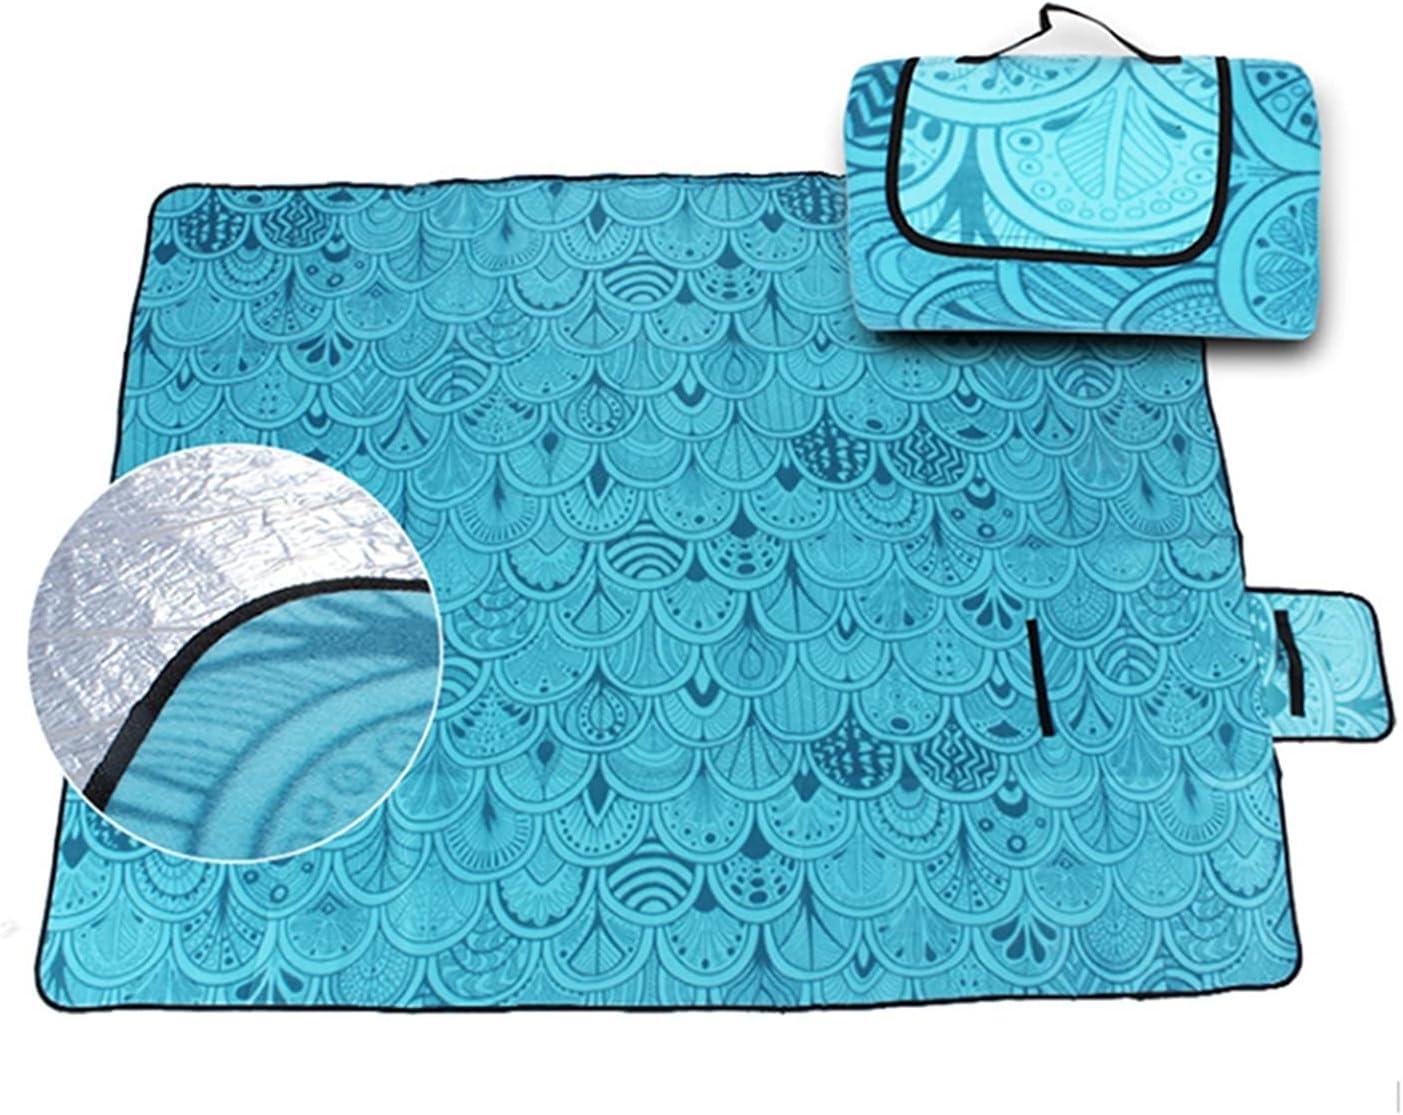 yangmeng Over item handling ☆ 2x1.5m Waterproof Year-end annual account Folding Picnic Camping Outdoor B Mat